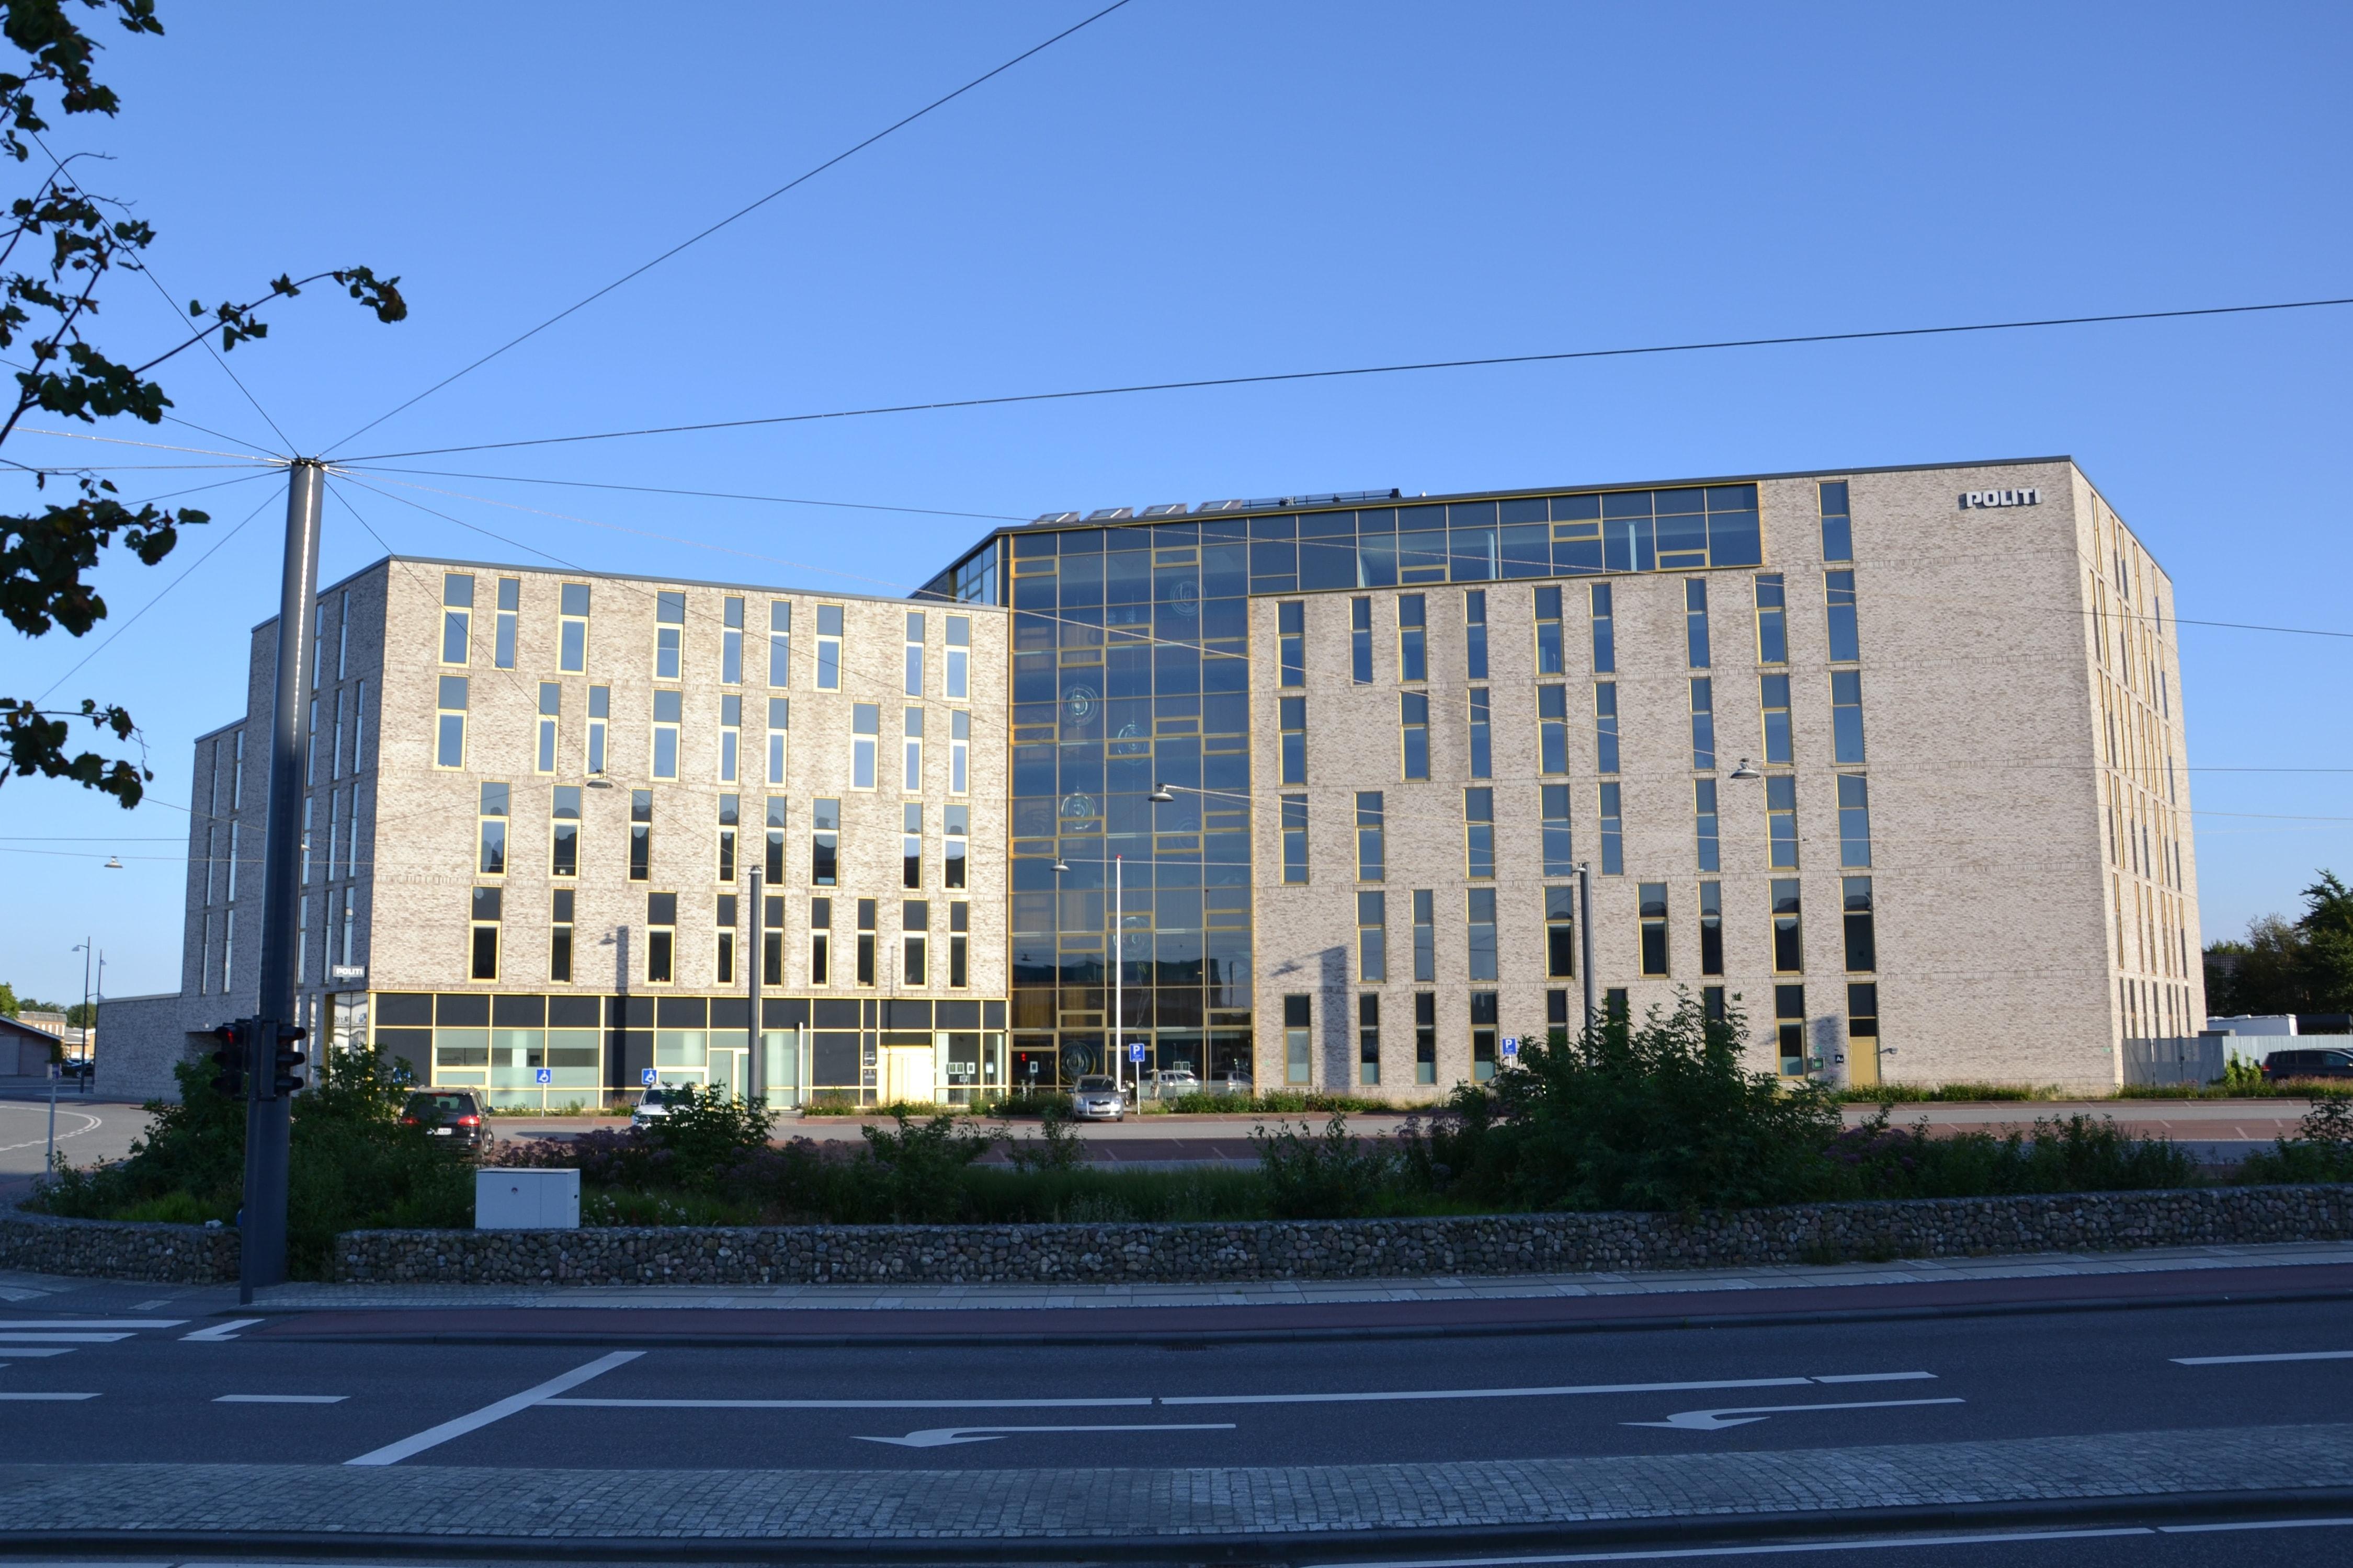 Politistationen i Holstebro